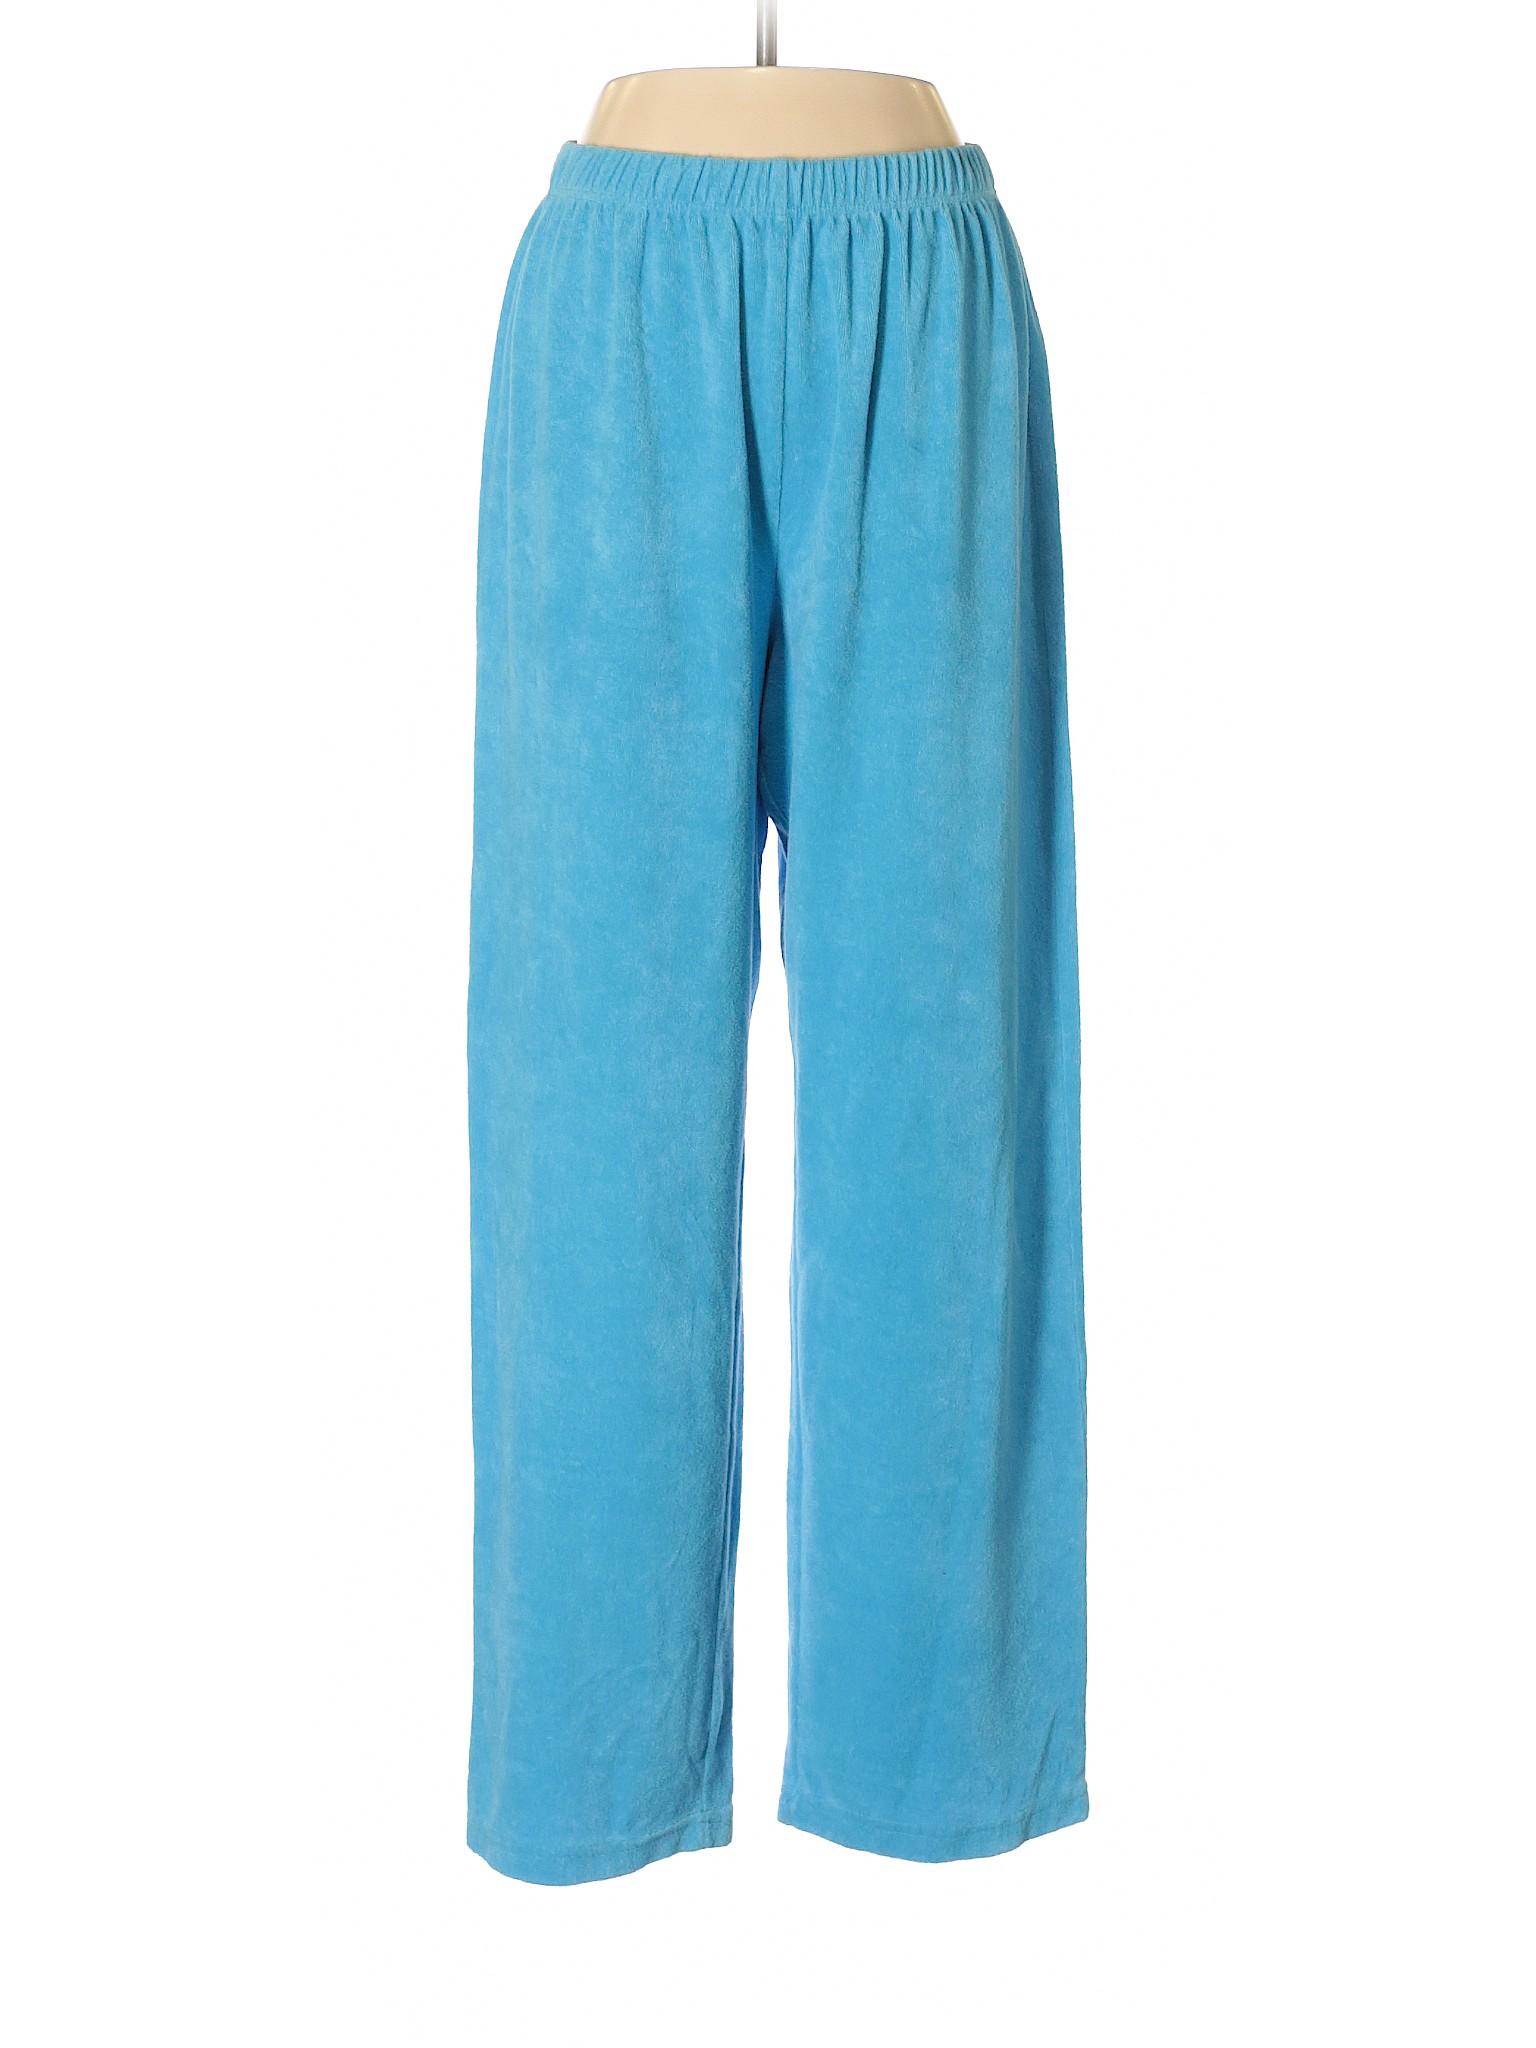 Jordan winter Taylor Boutique Pants Casual g5npwqY